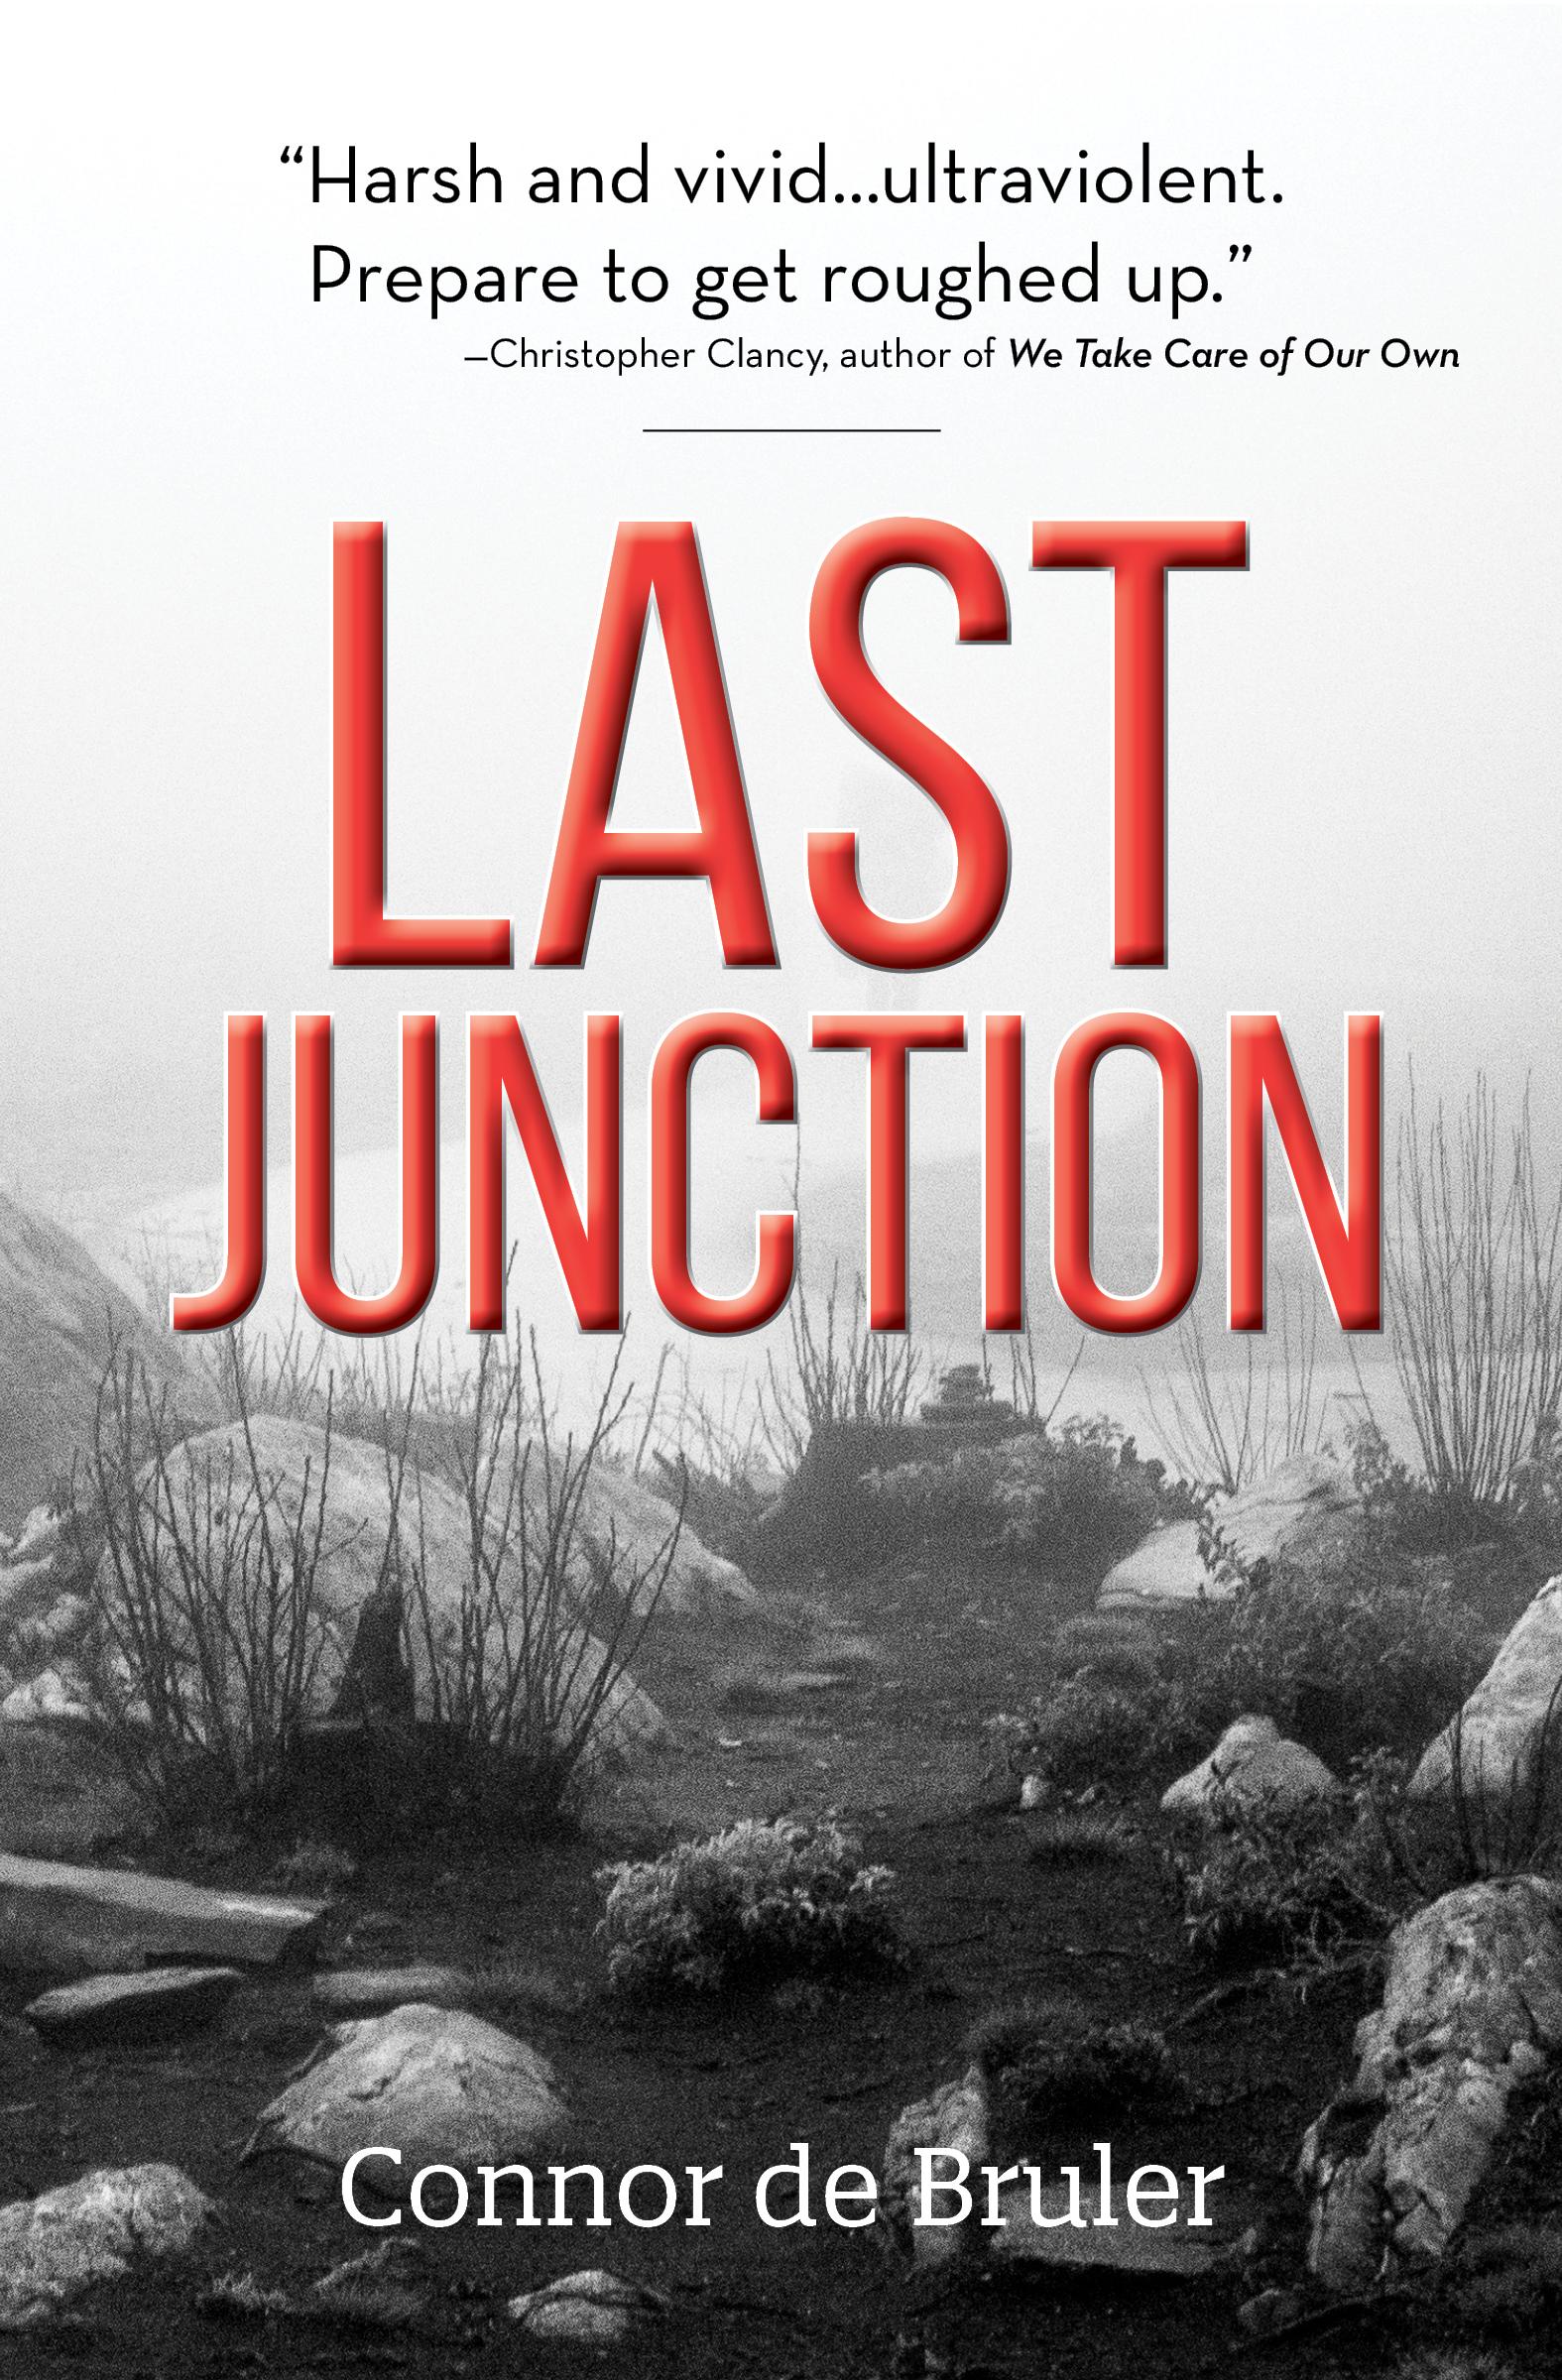 Last Junction